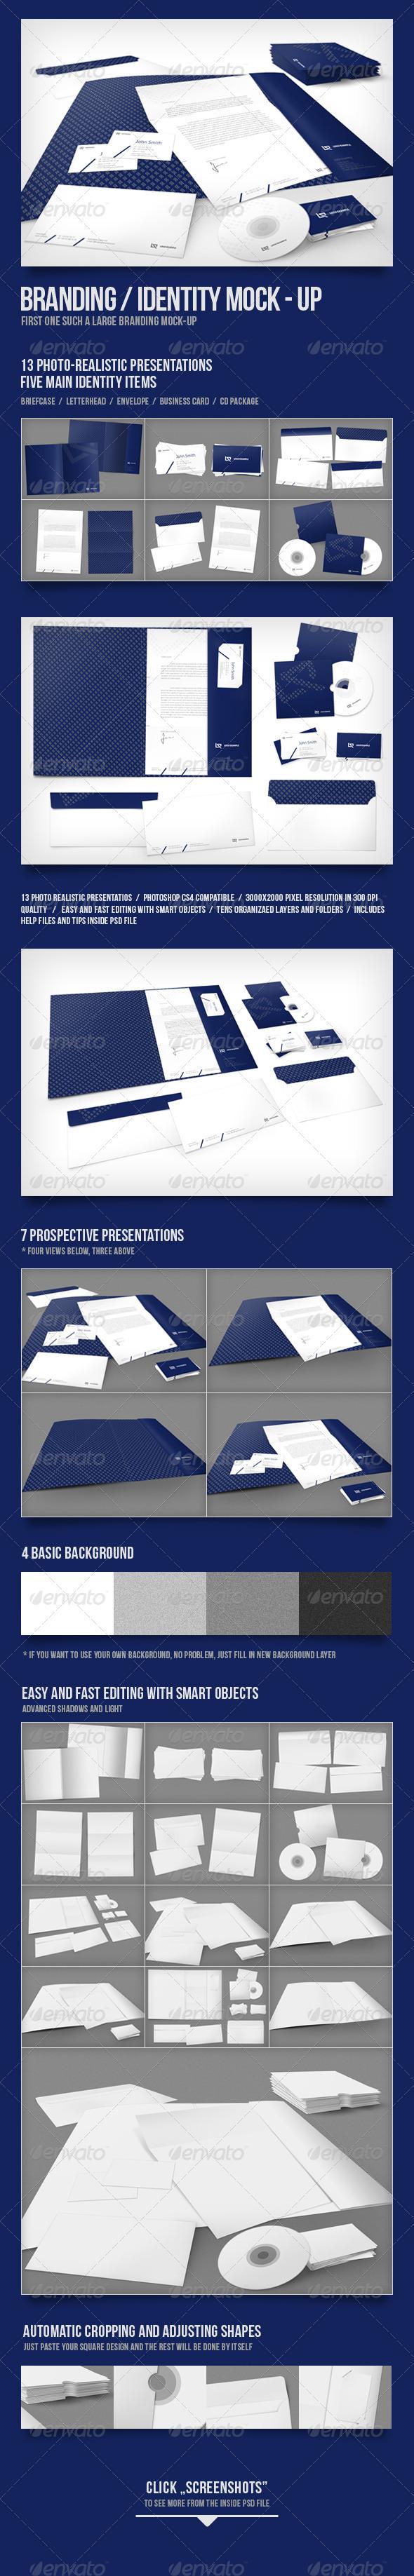 GraphicRiver Branding Identity Mock-up 2319067